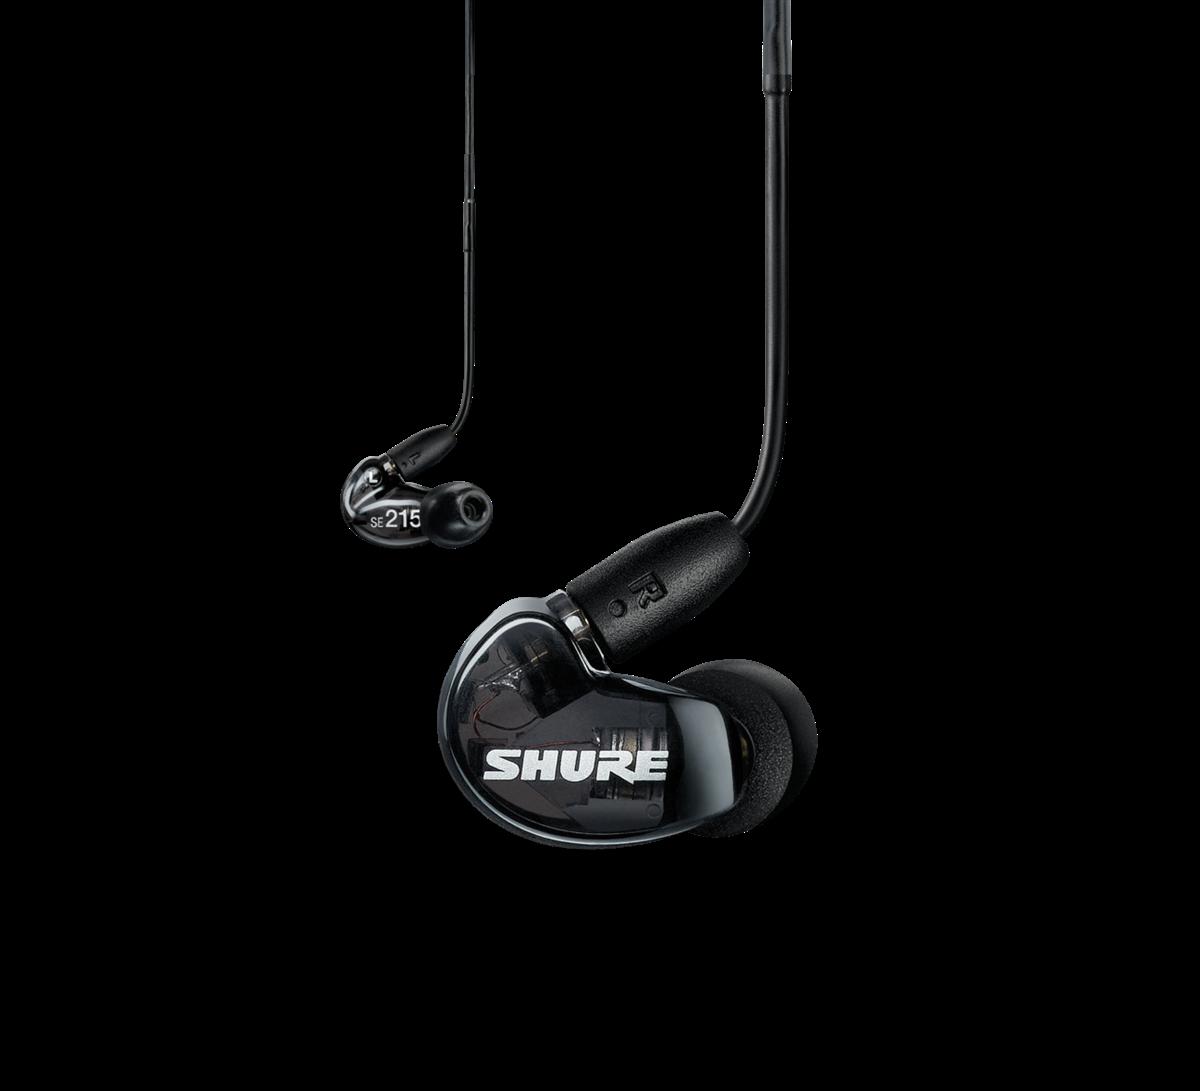 Shure SE215 Earphones RMCE-UNI - BLACK